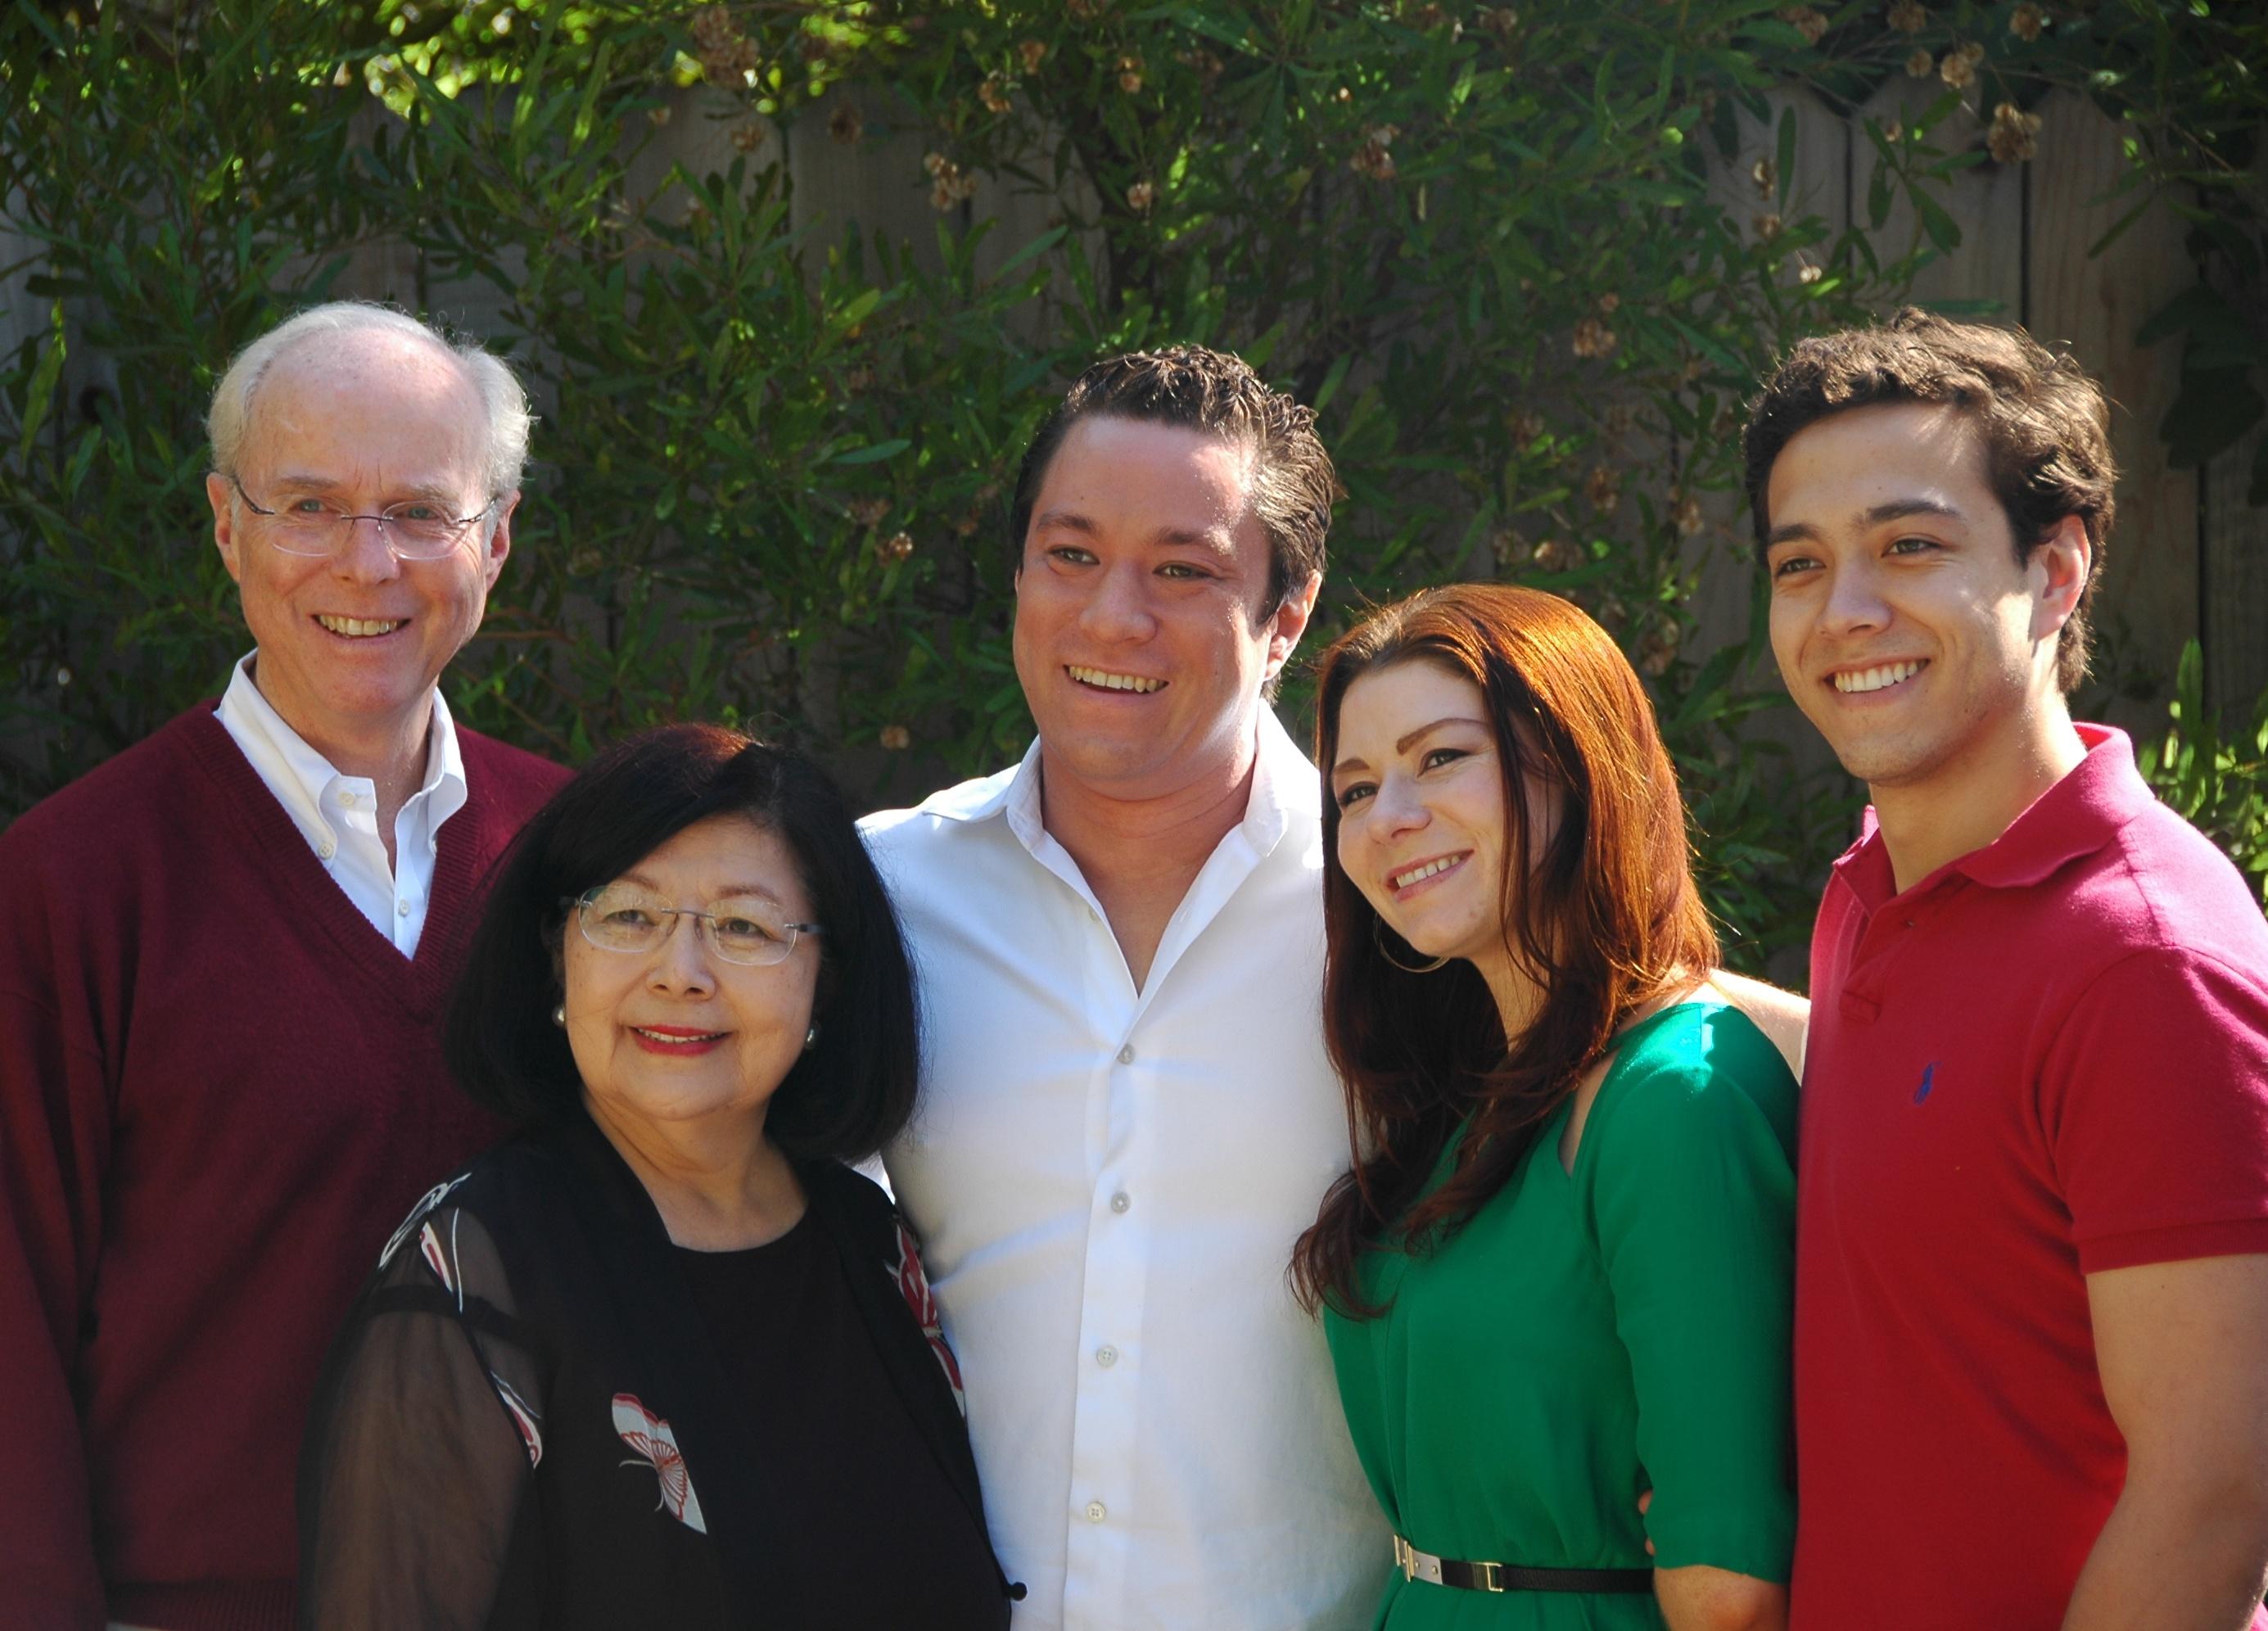 Pattison-Family-Gordon-Anna-Geoffrey-Miriam-Andrew